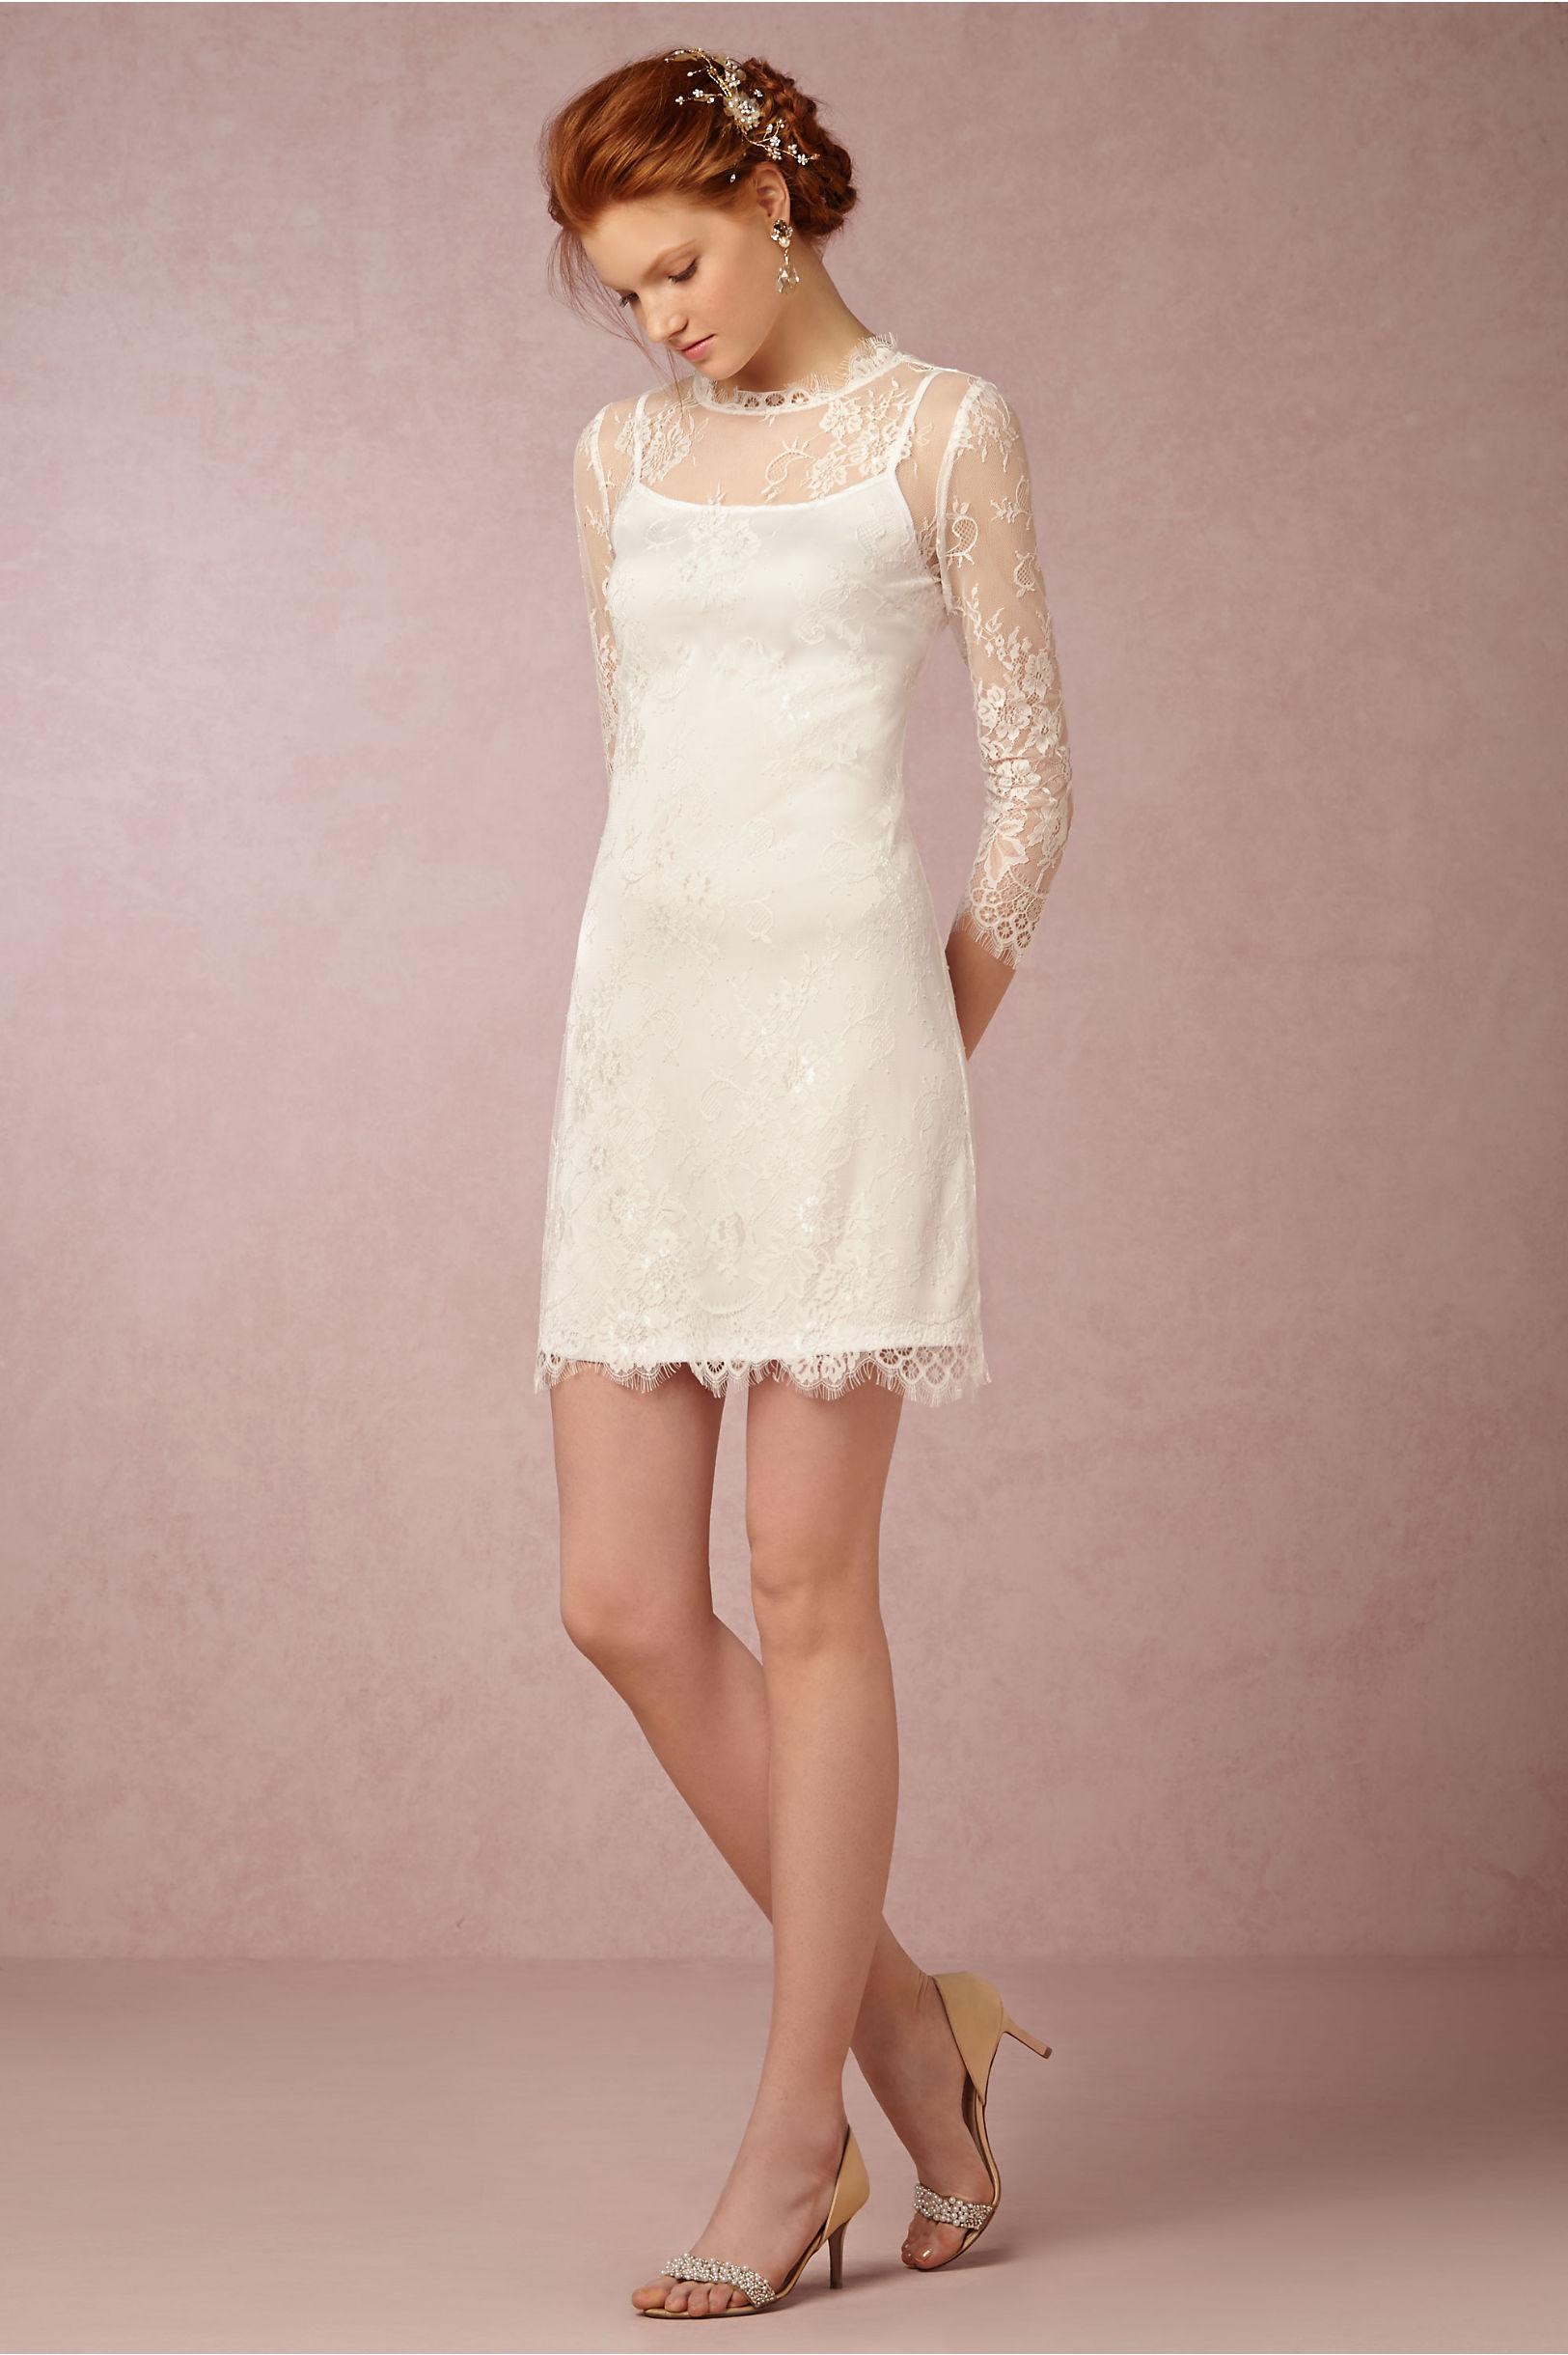 Candela Short Wedding Dress.jpg